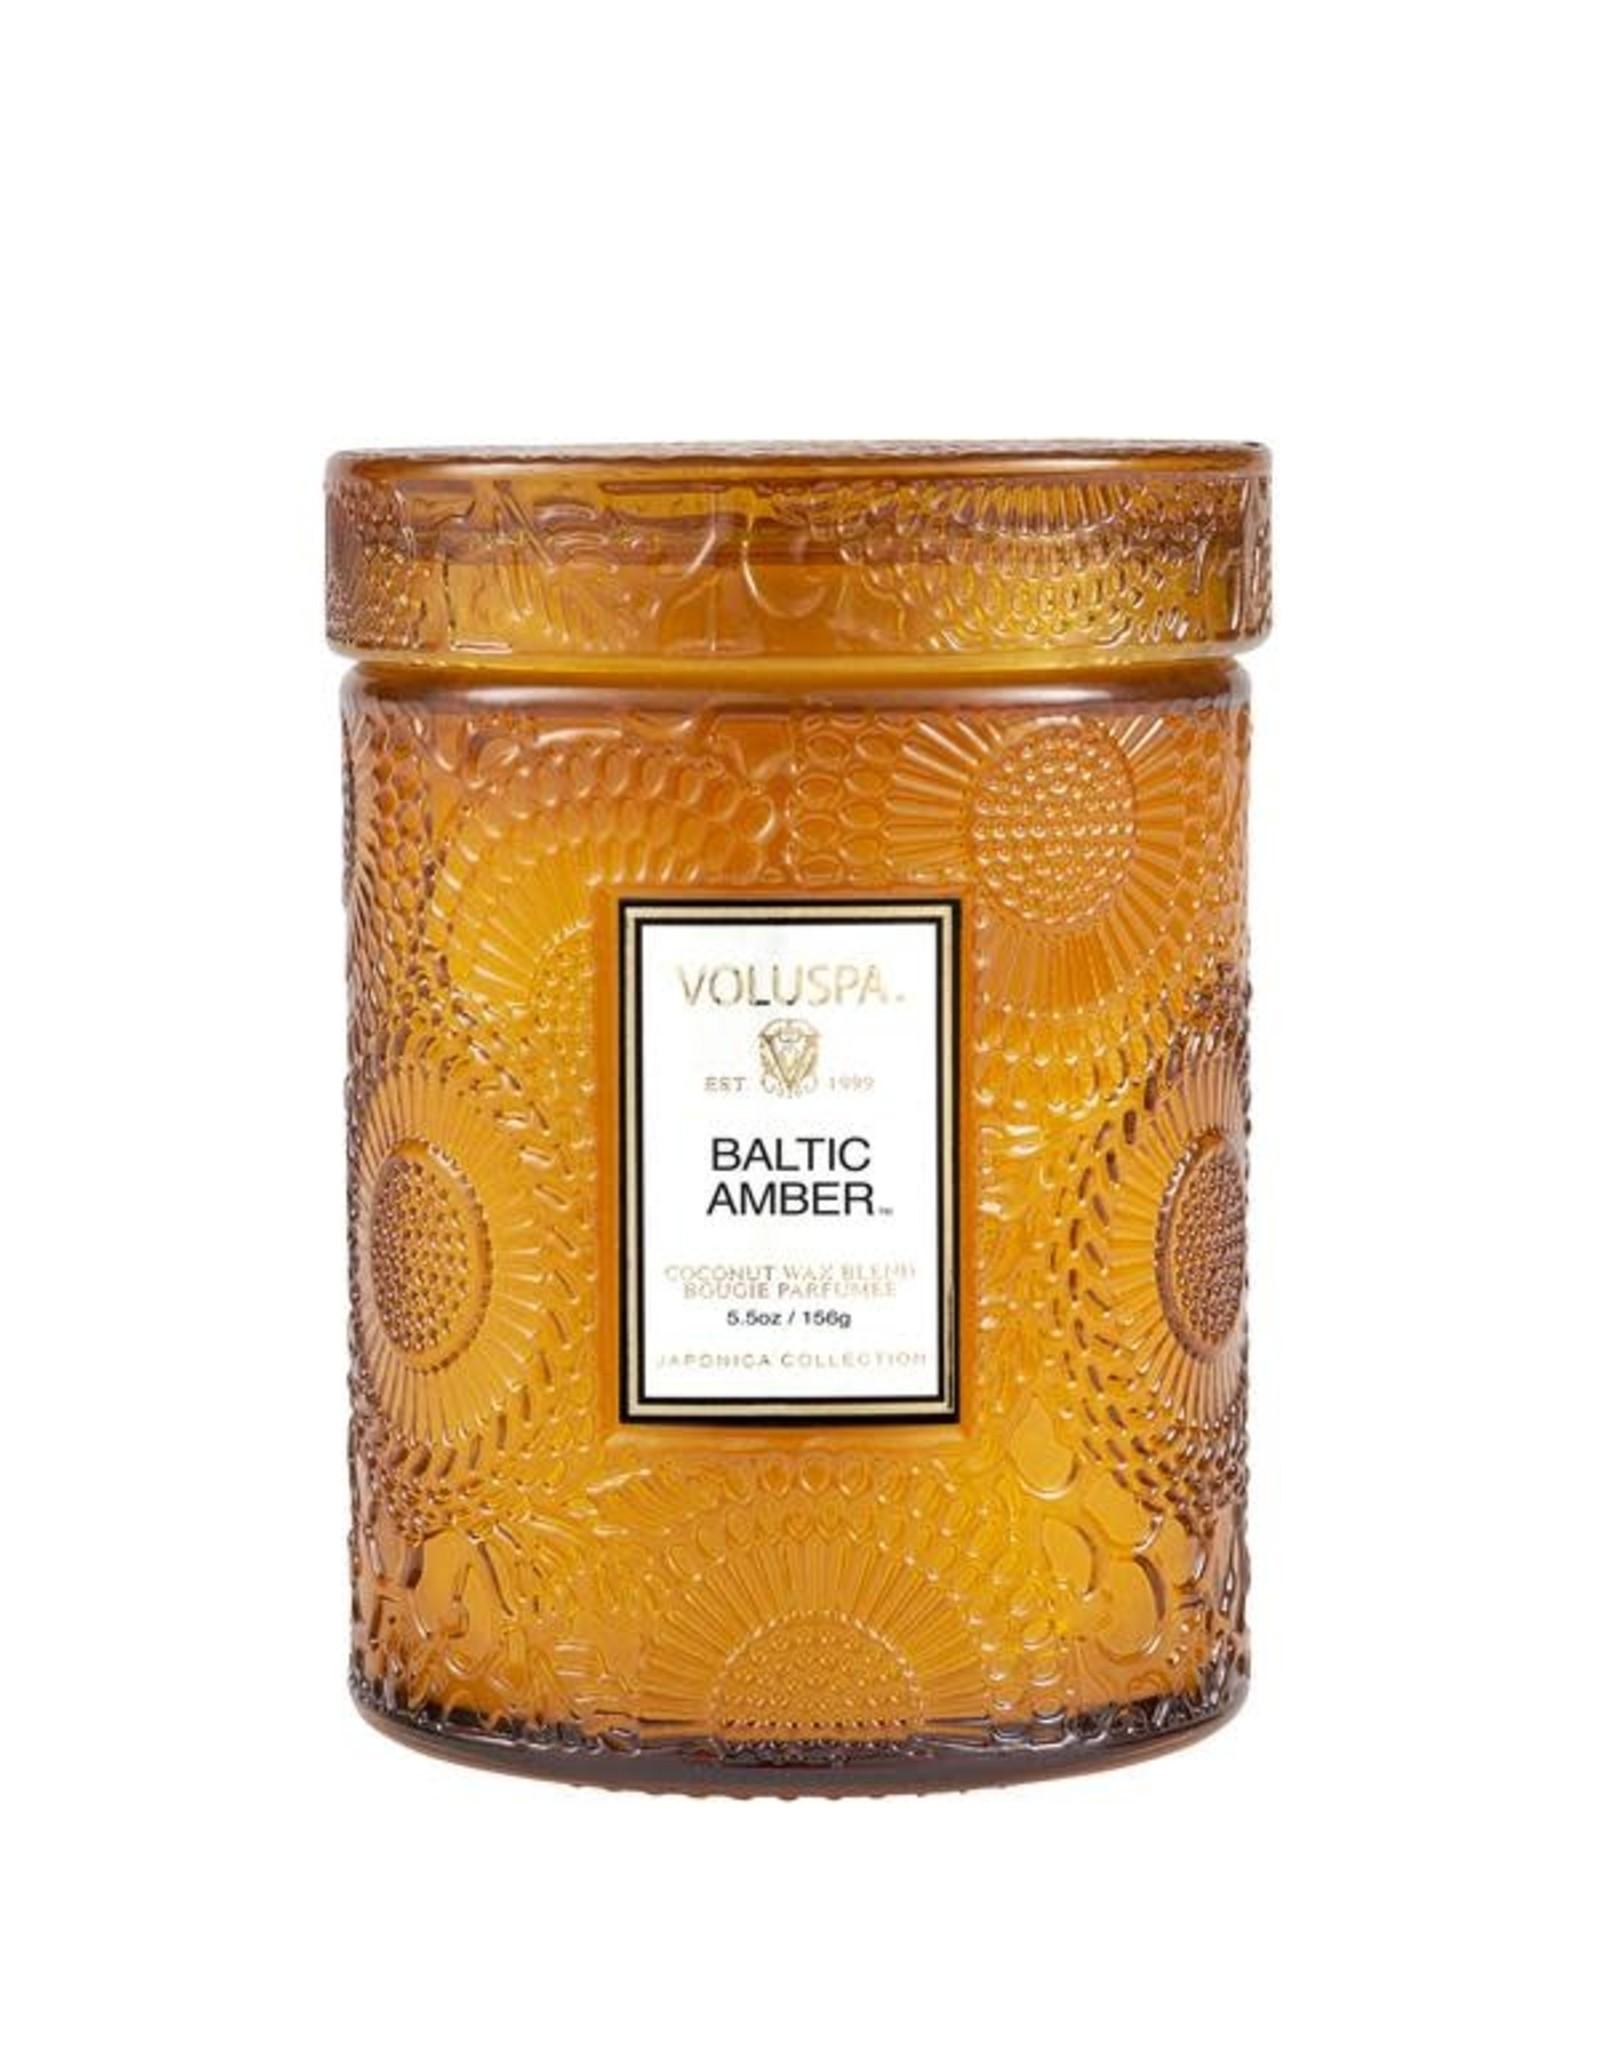 Voluspa Small Jar Candle